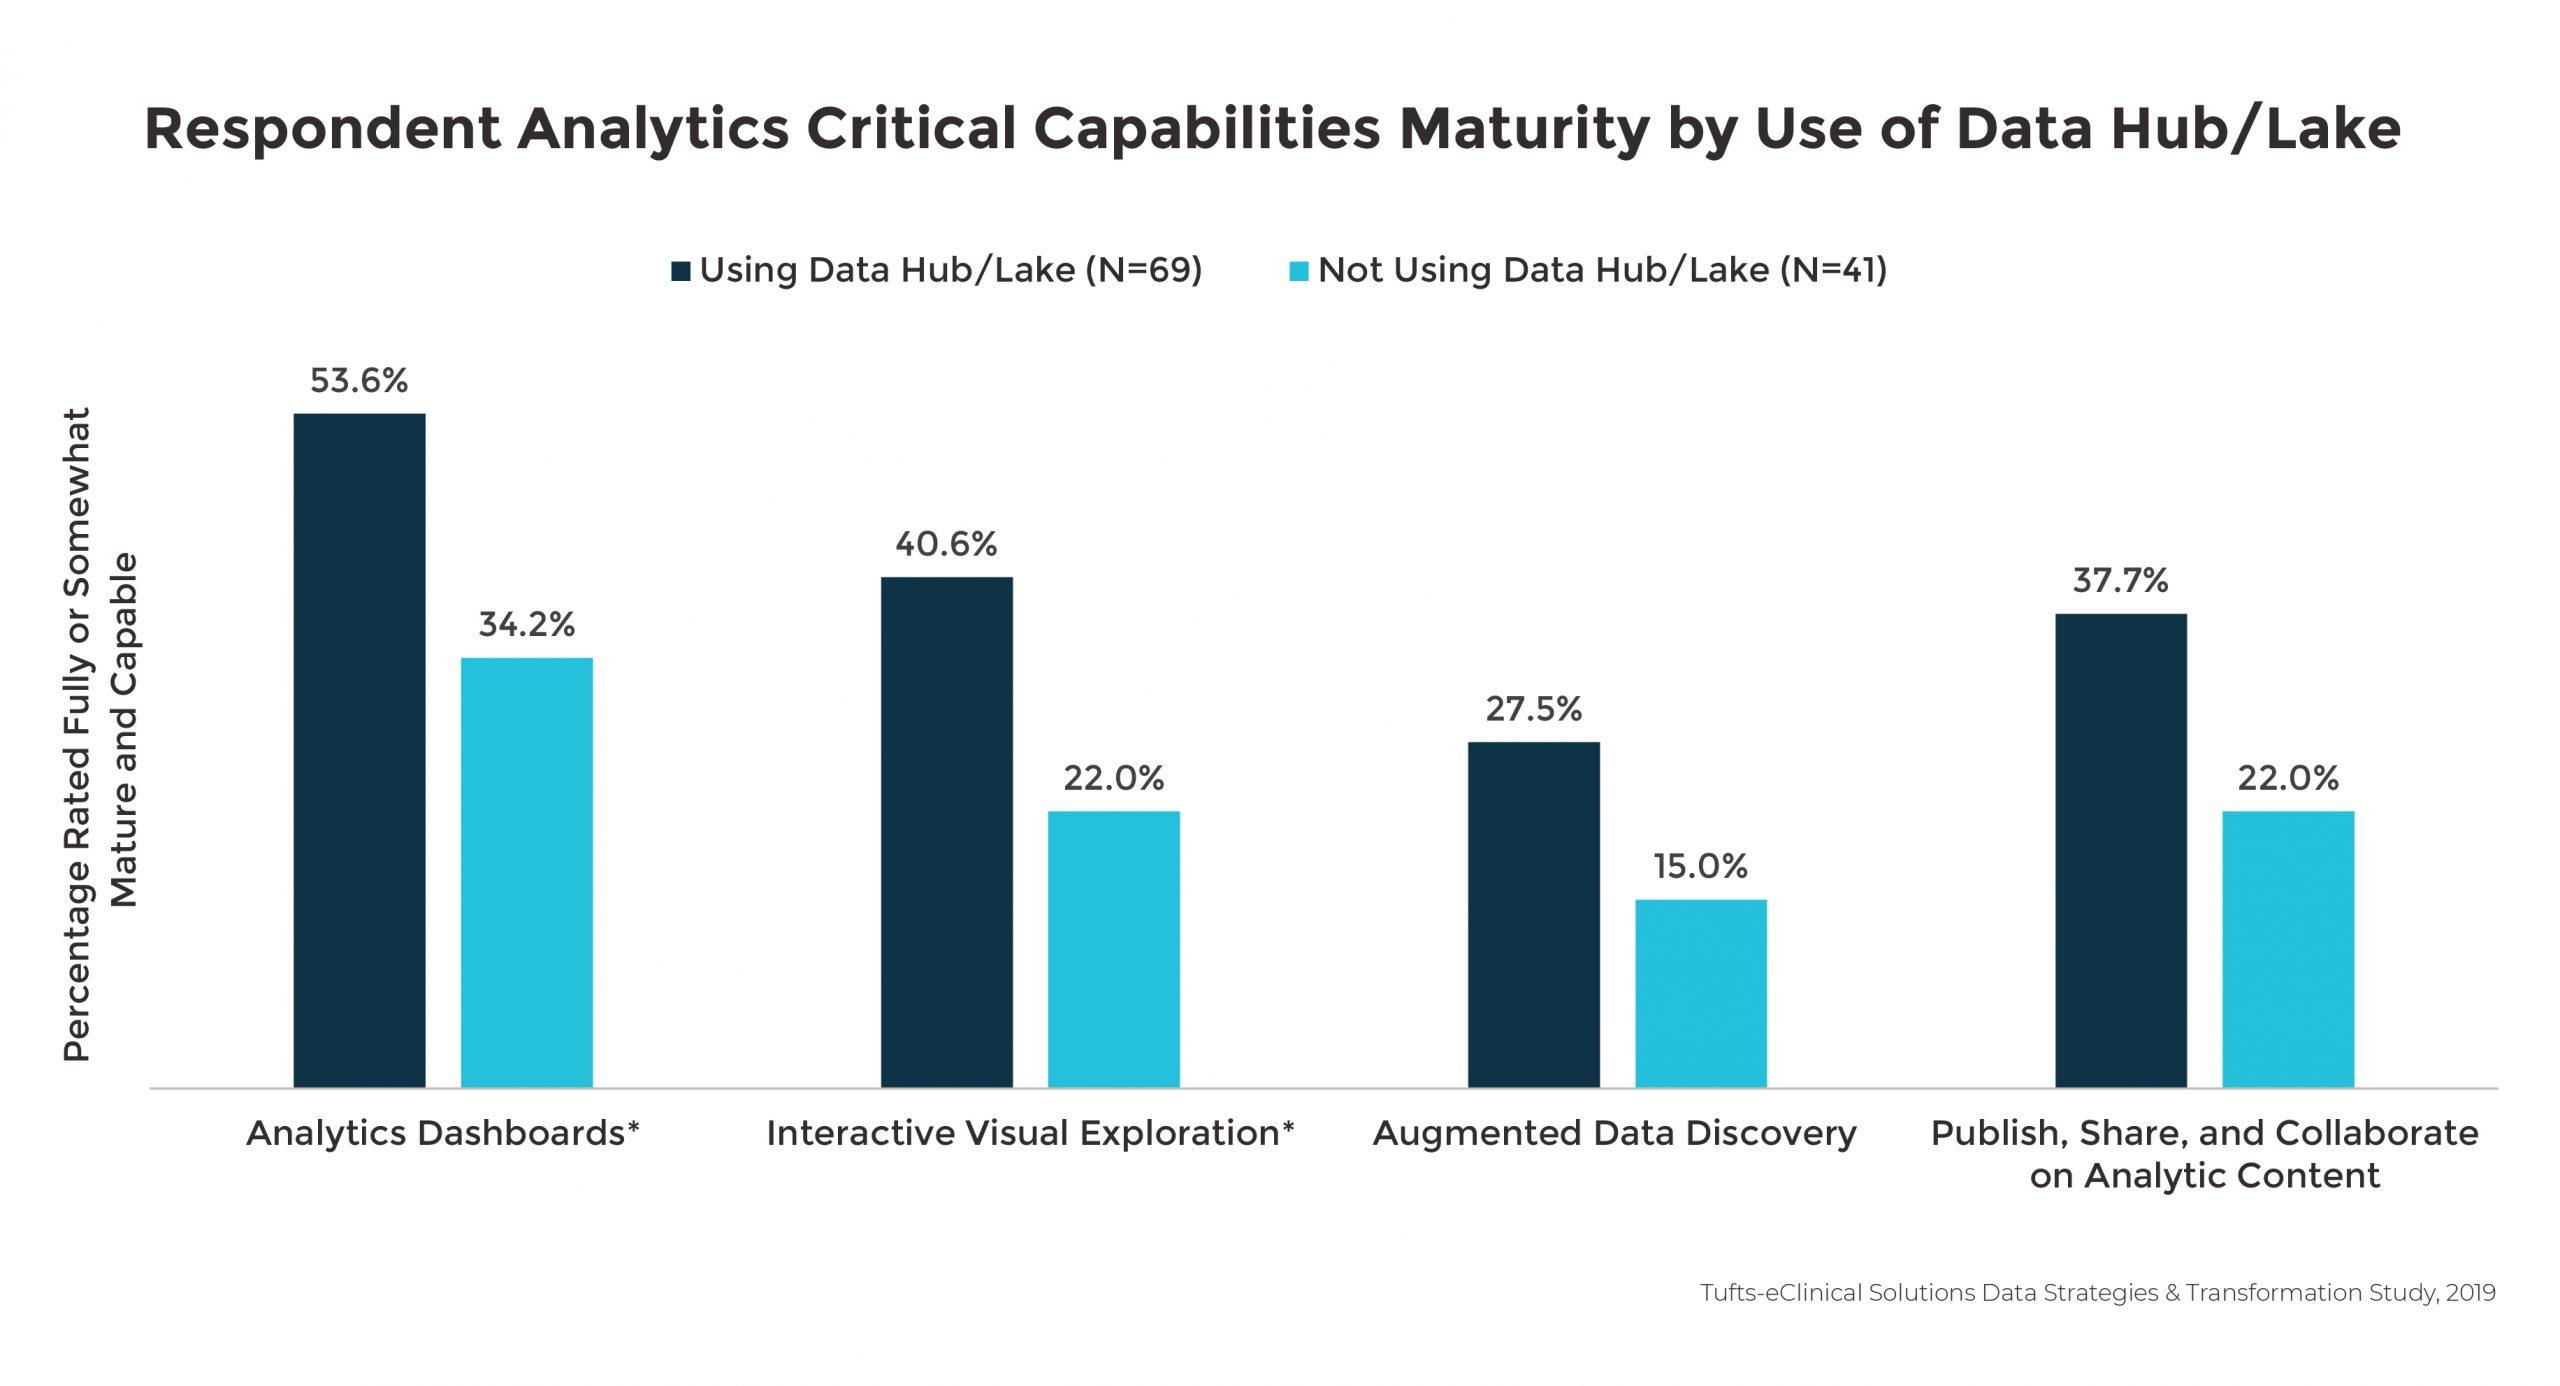 Respondent Analytics Critical Capabilities Maturity by Use of Data Hub/Lake